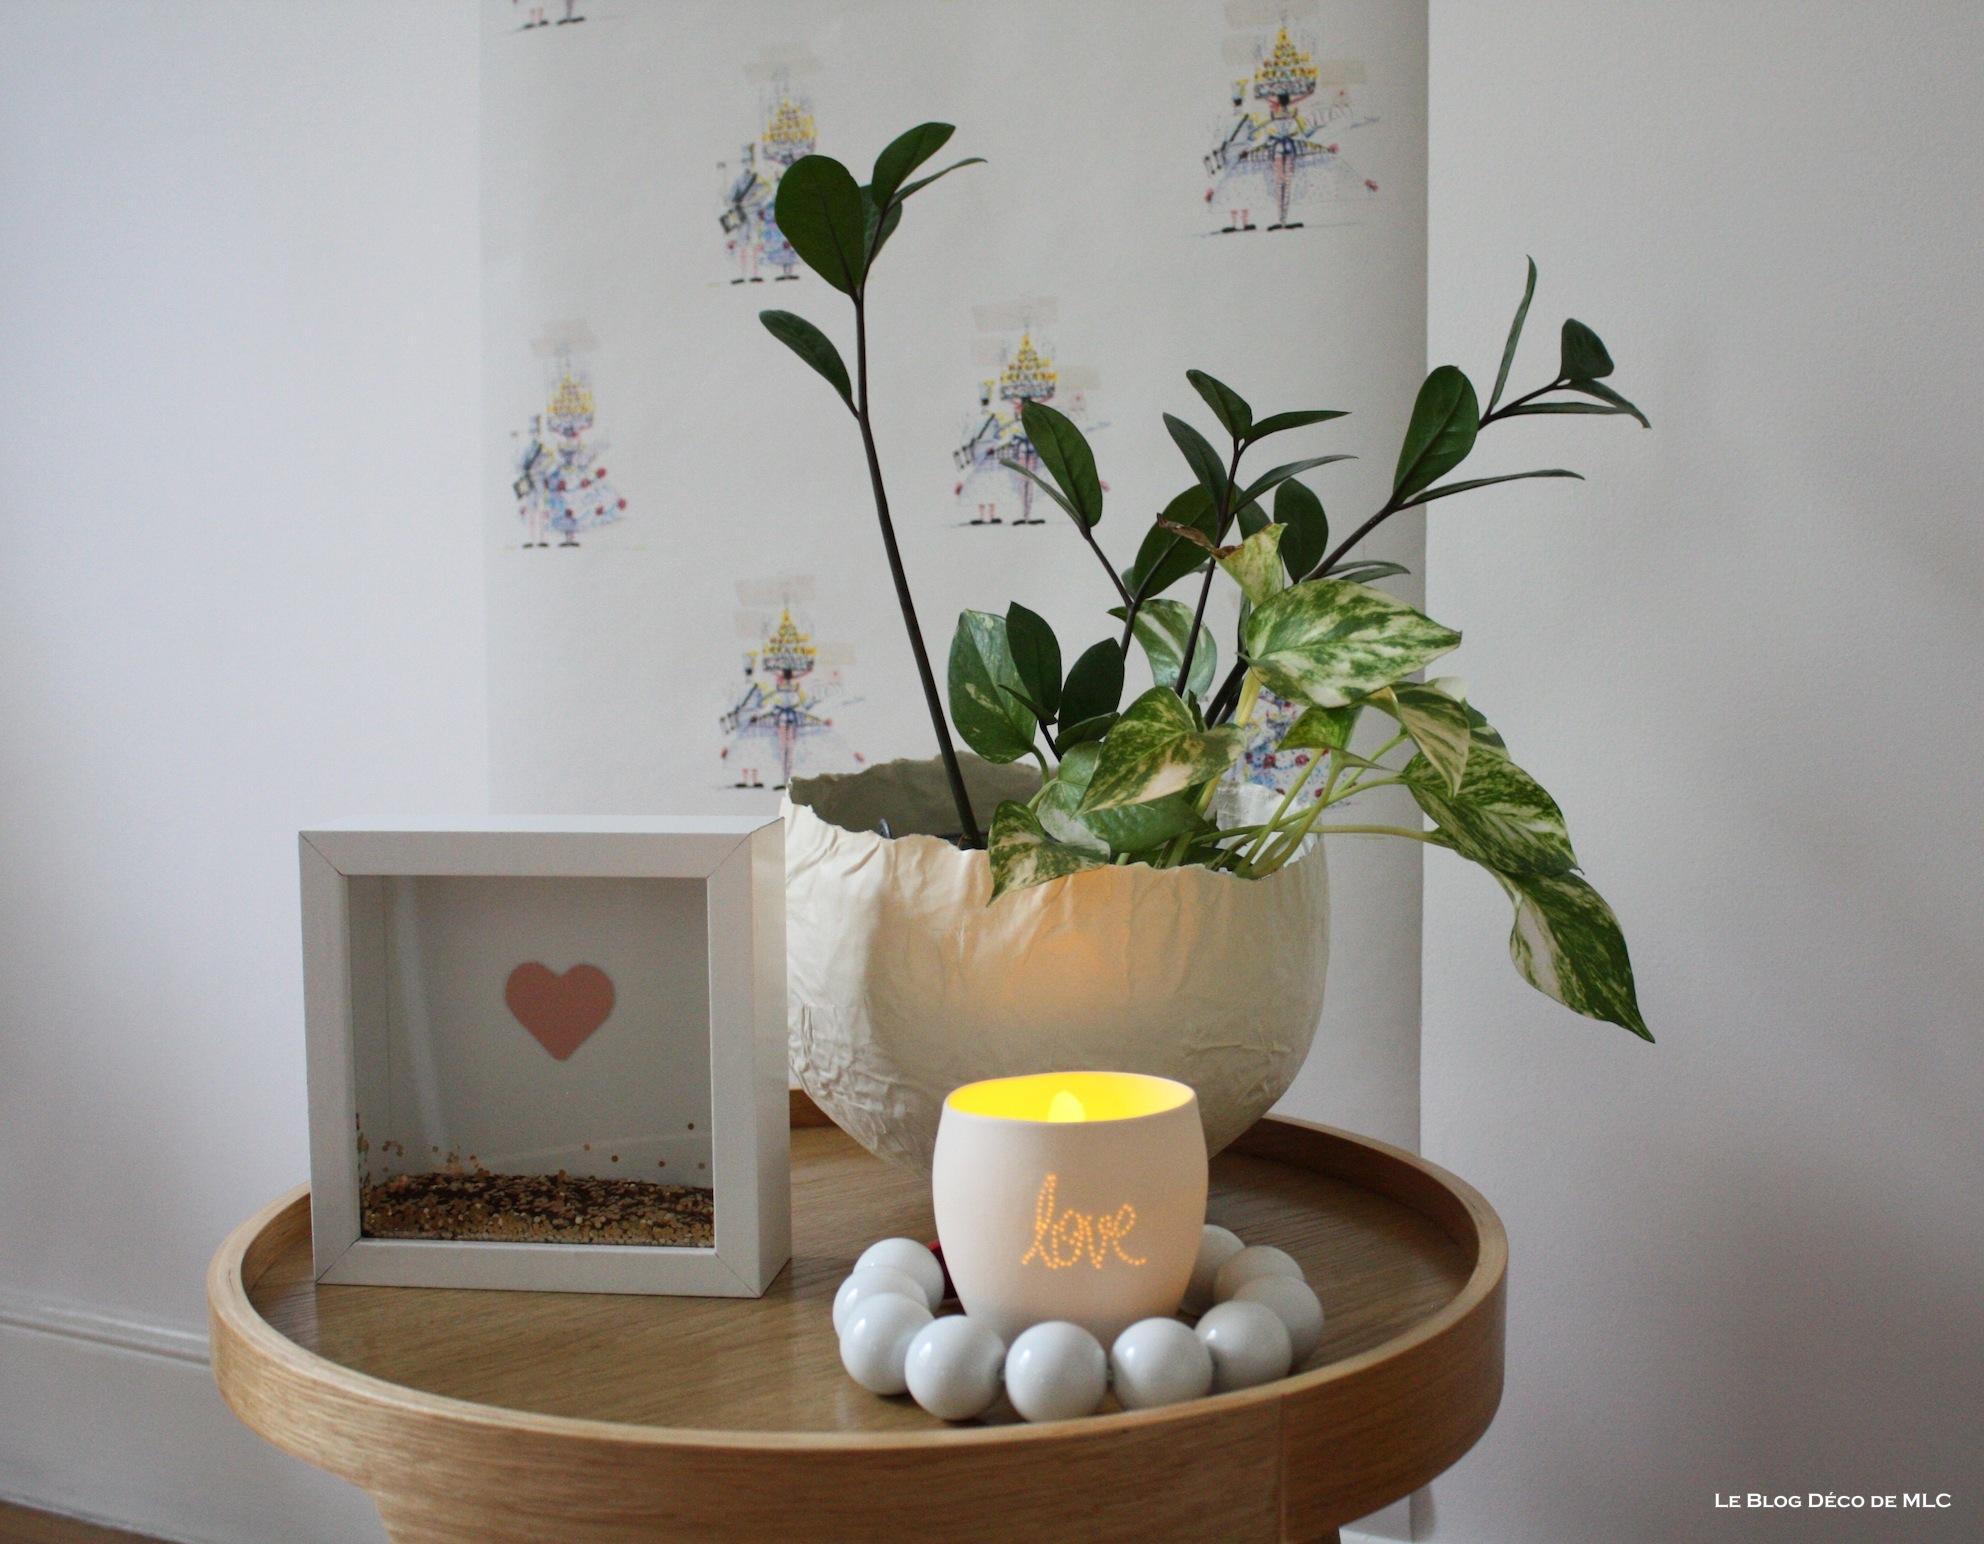 coeur-epingle-saint-valentin